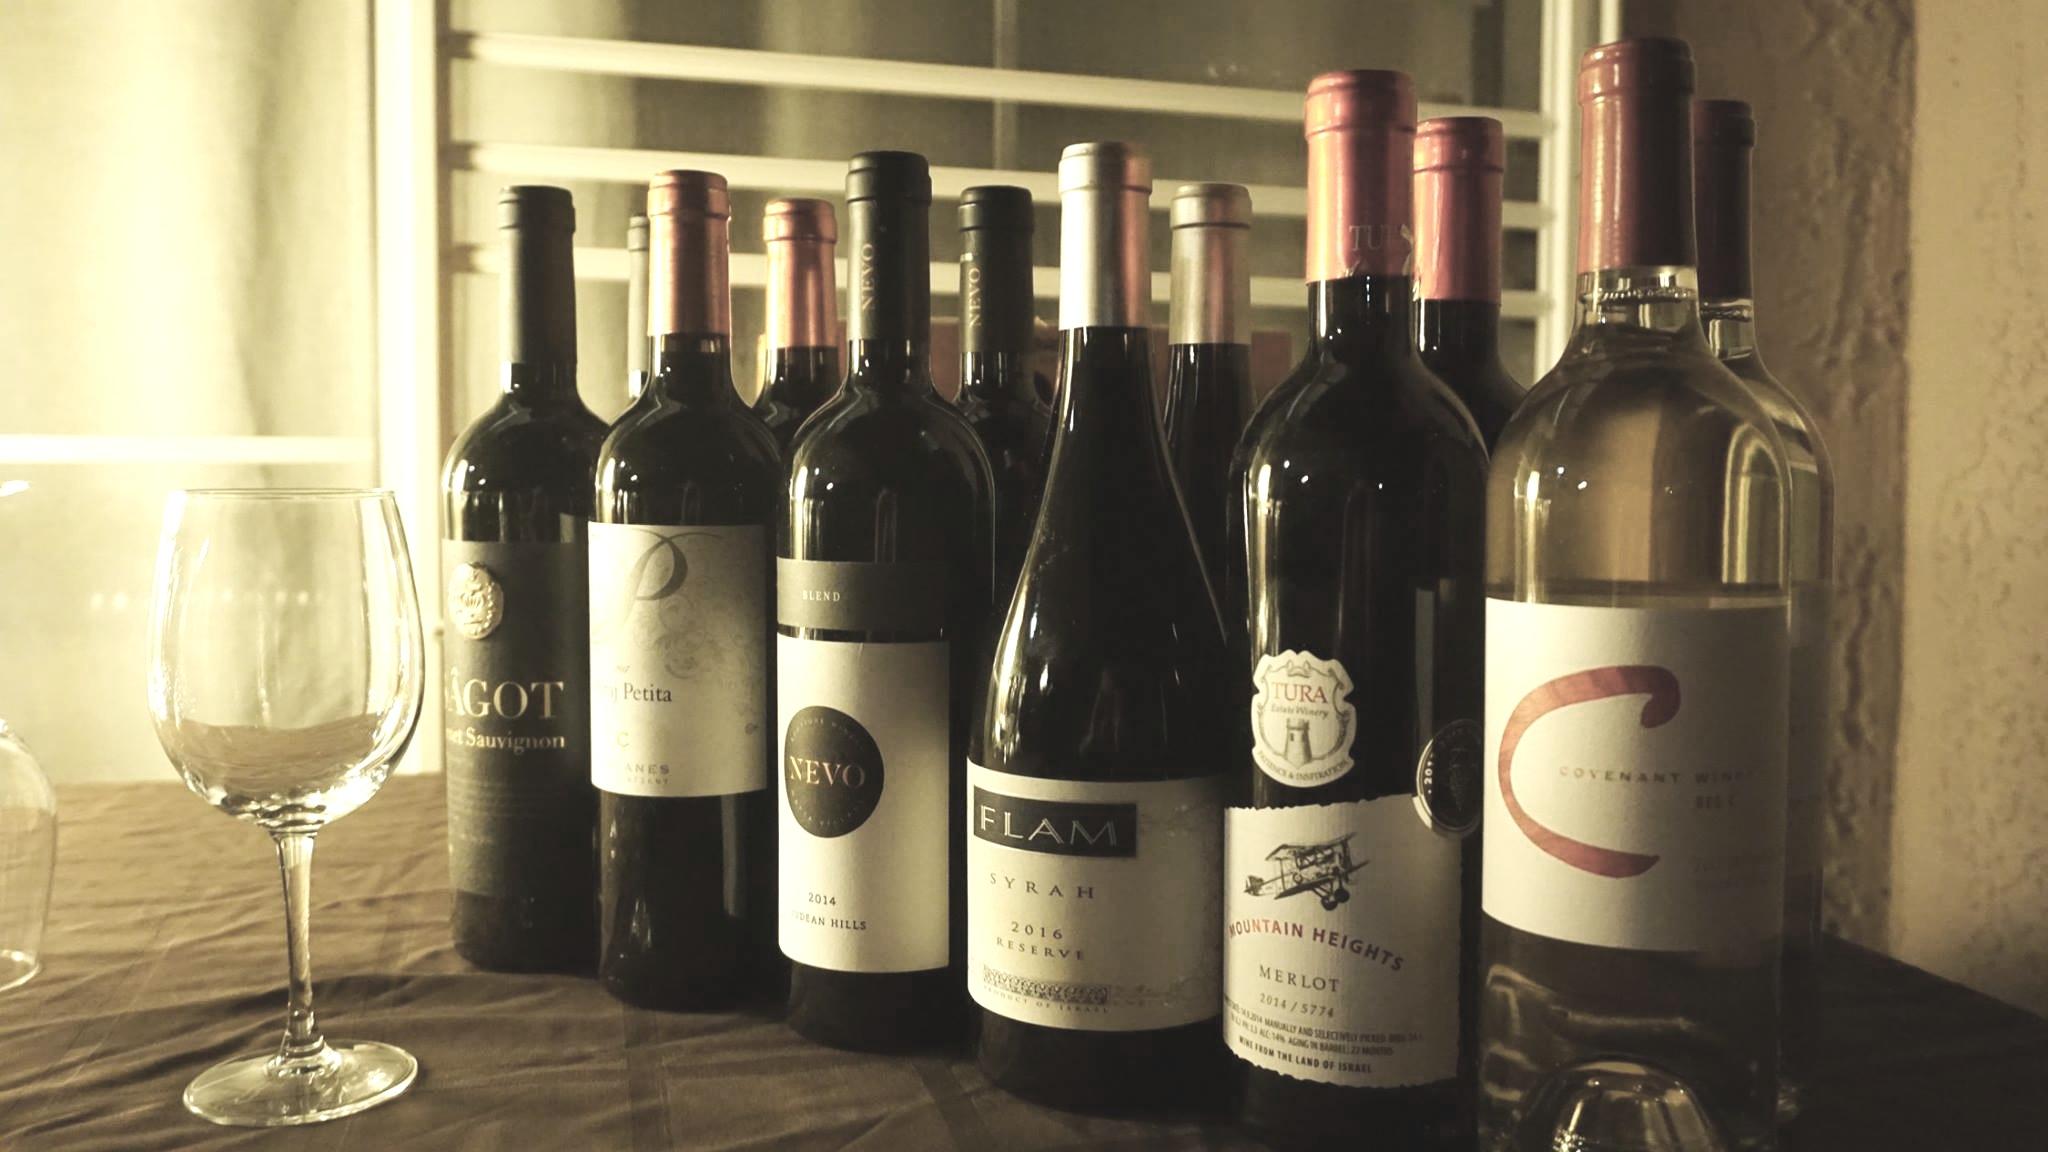 makor+wine+night+1.jpg